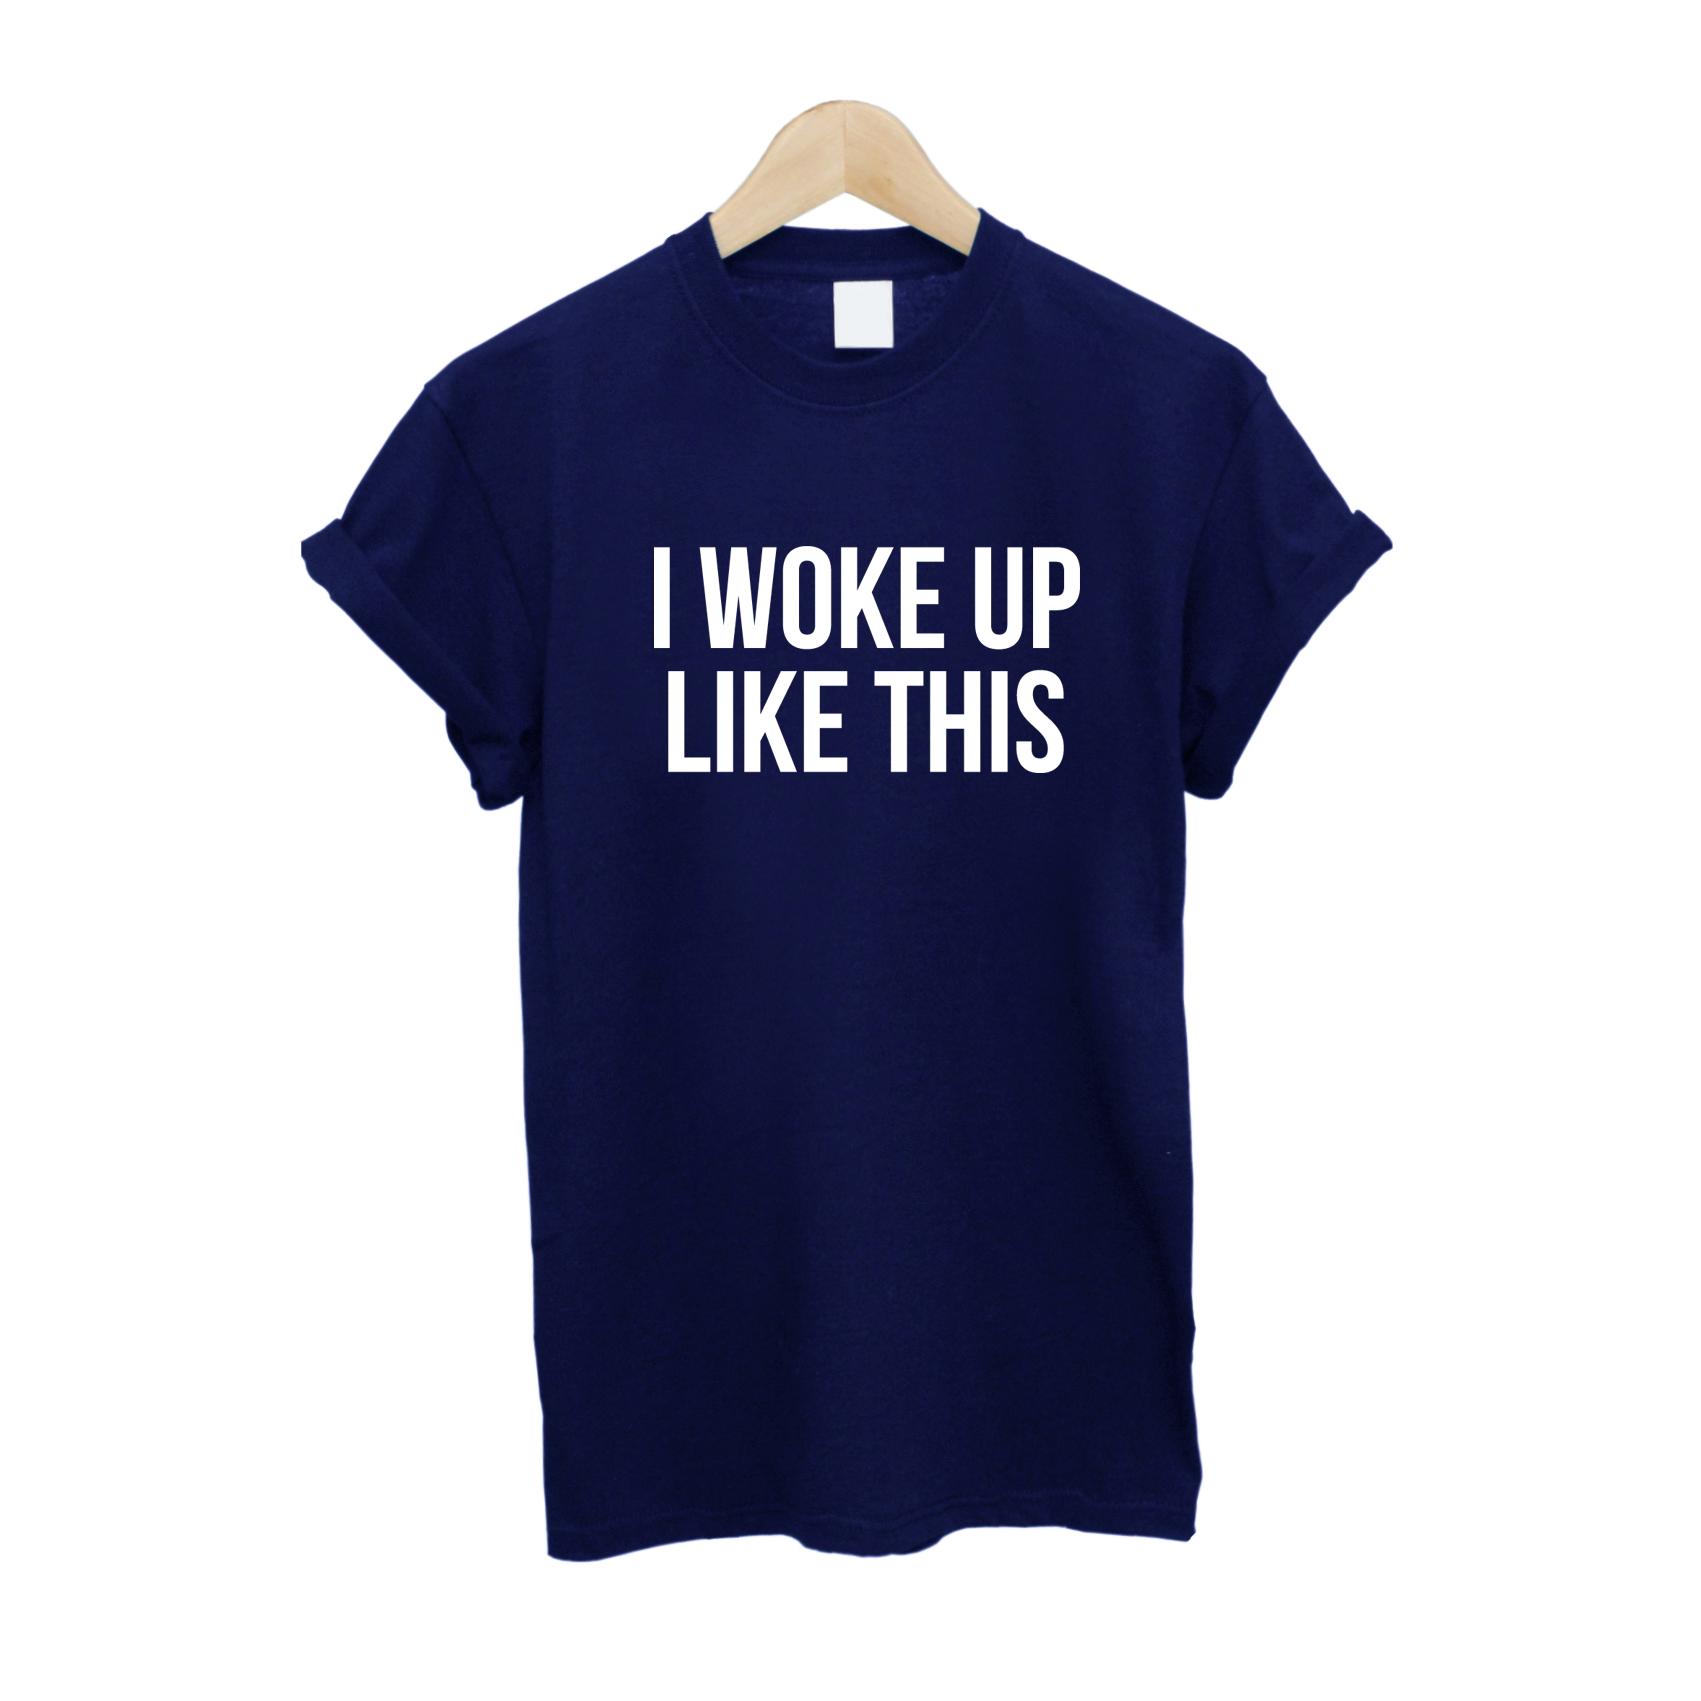 I Woke Up Like This T Shirt £10   Free UK Delivery - #TeeIsland